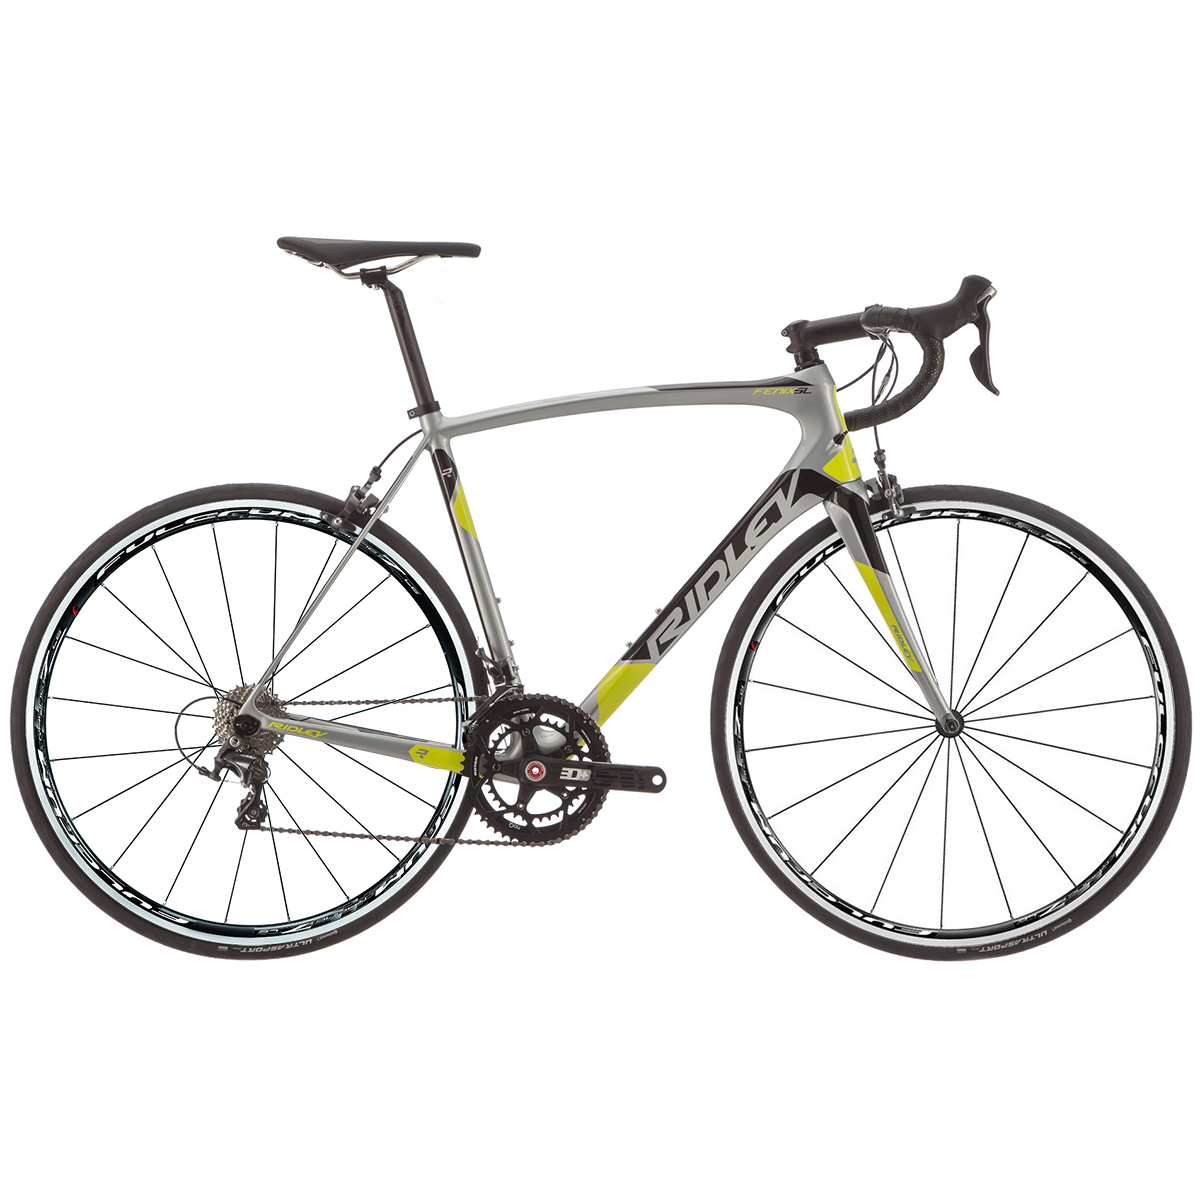 Ridley Fenix SL Ultegra/Rotor Carbon Road Bike - 2017